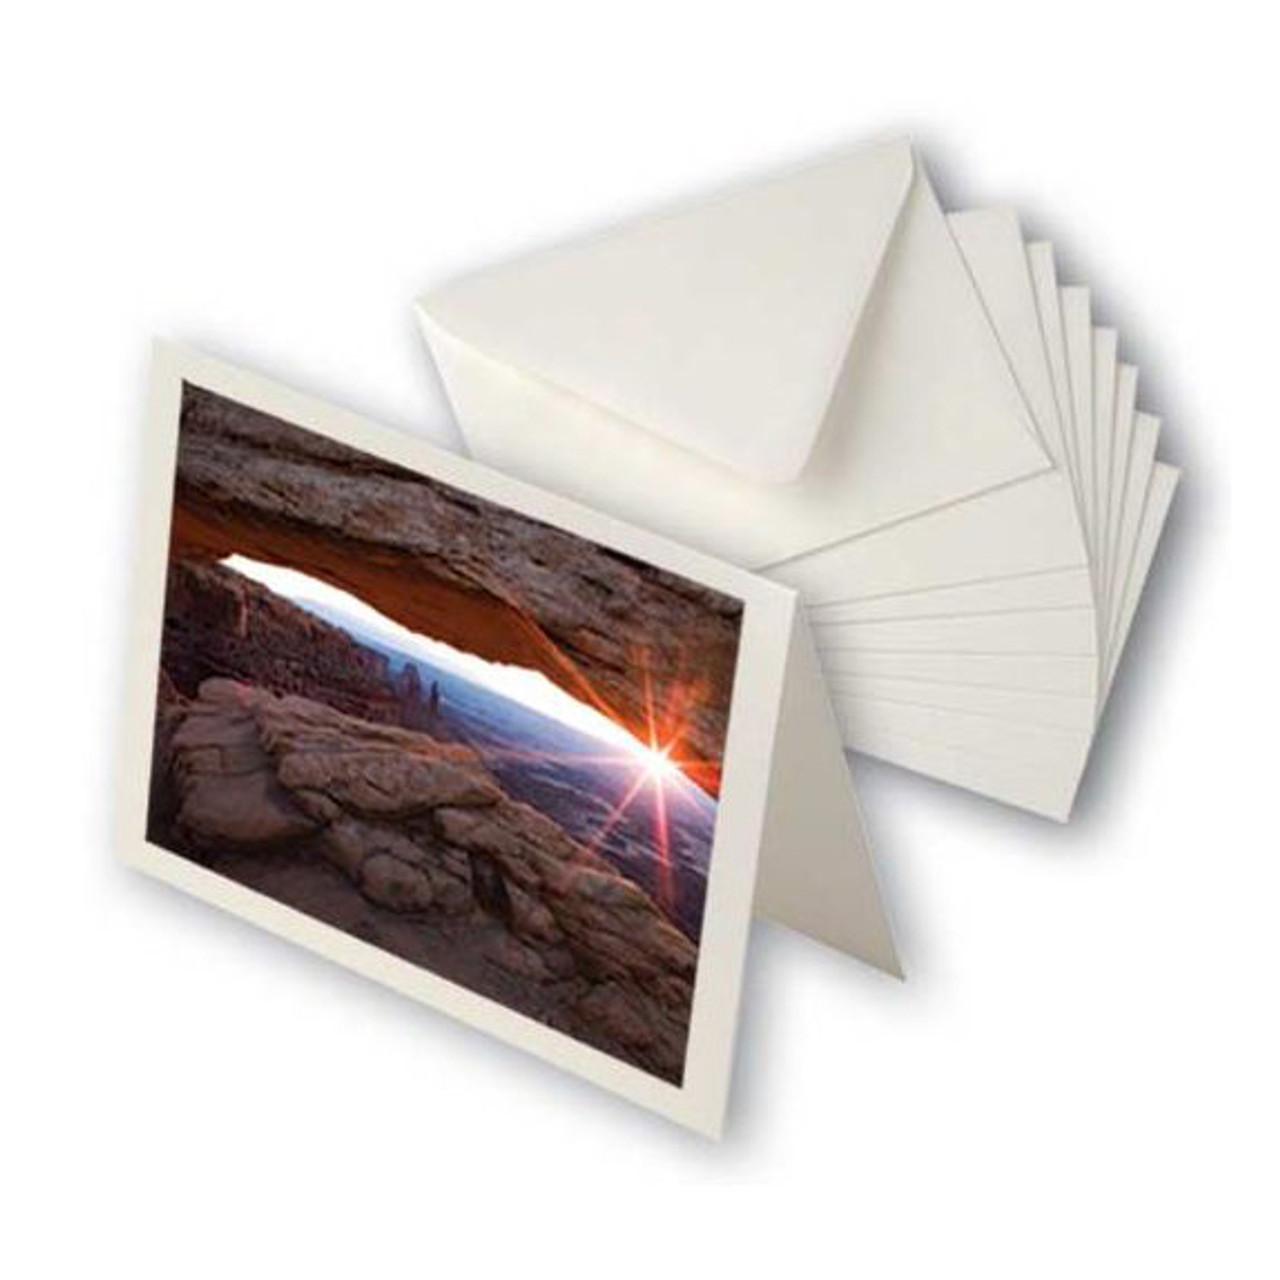 MOAB ENTRADALOPES 190 CARD/ENVELOPE - BRIGHT